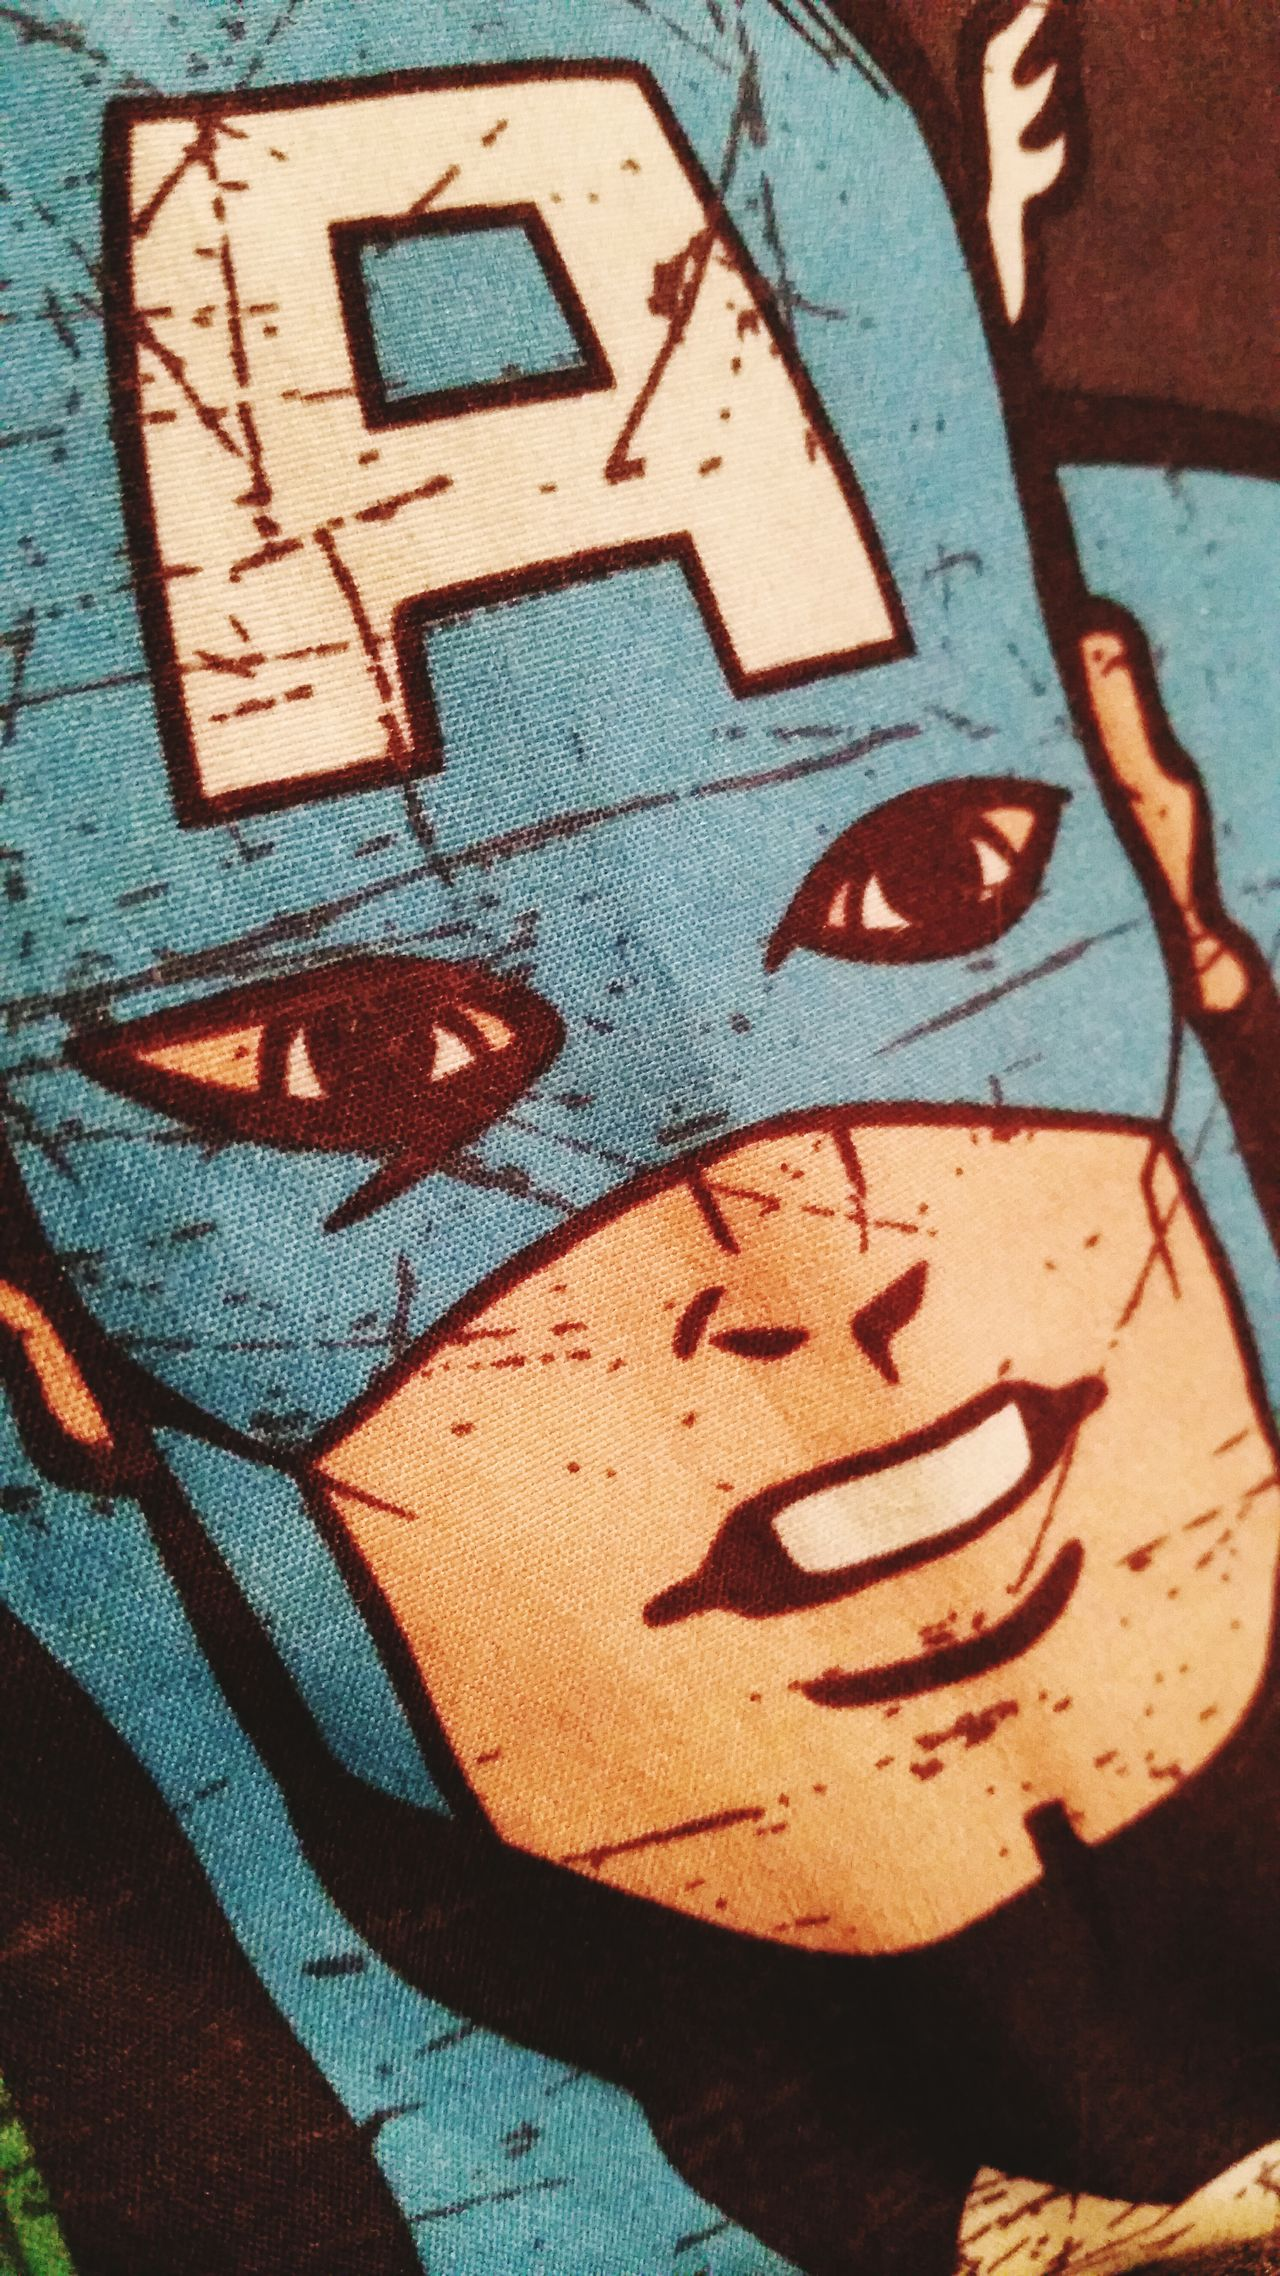 Superhero Captianamerica